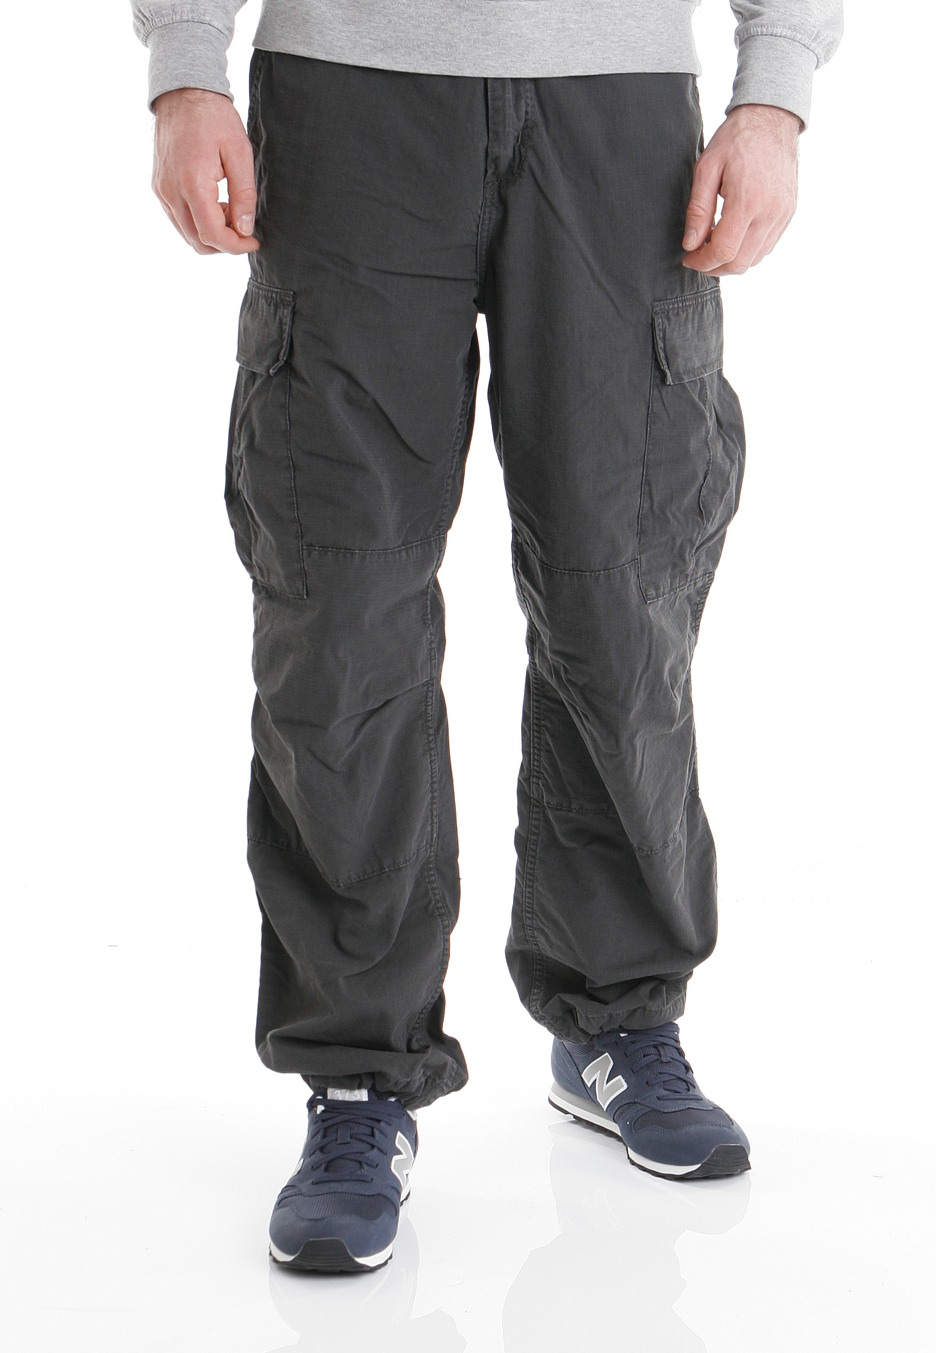 Carhartt WIP - Cargo Columbia Asphalt Stone Washed - Pants - Streetwear  Shop - Impericon.com Worldwide 111b3a8c5